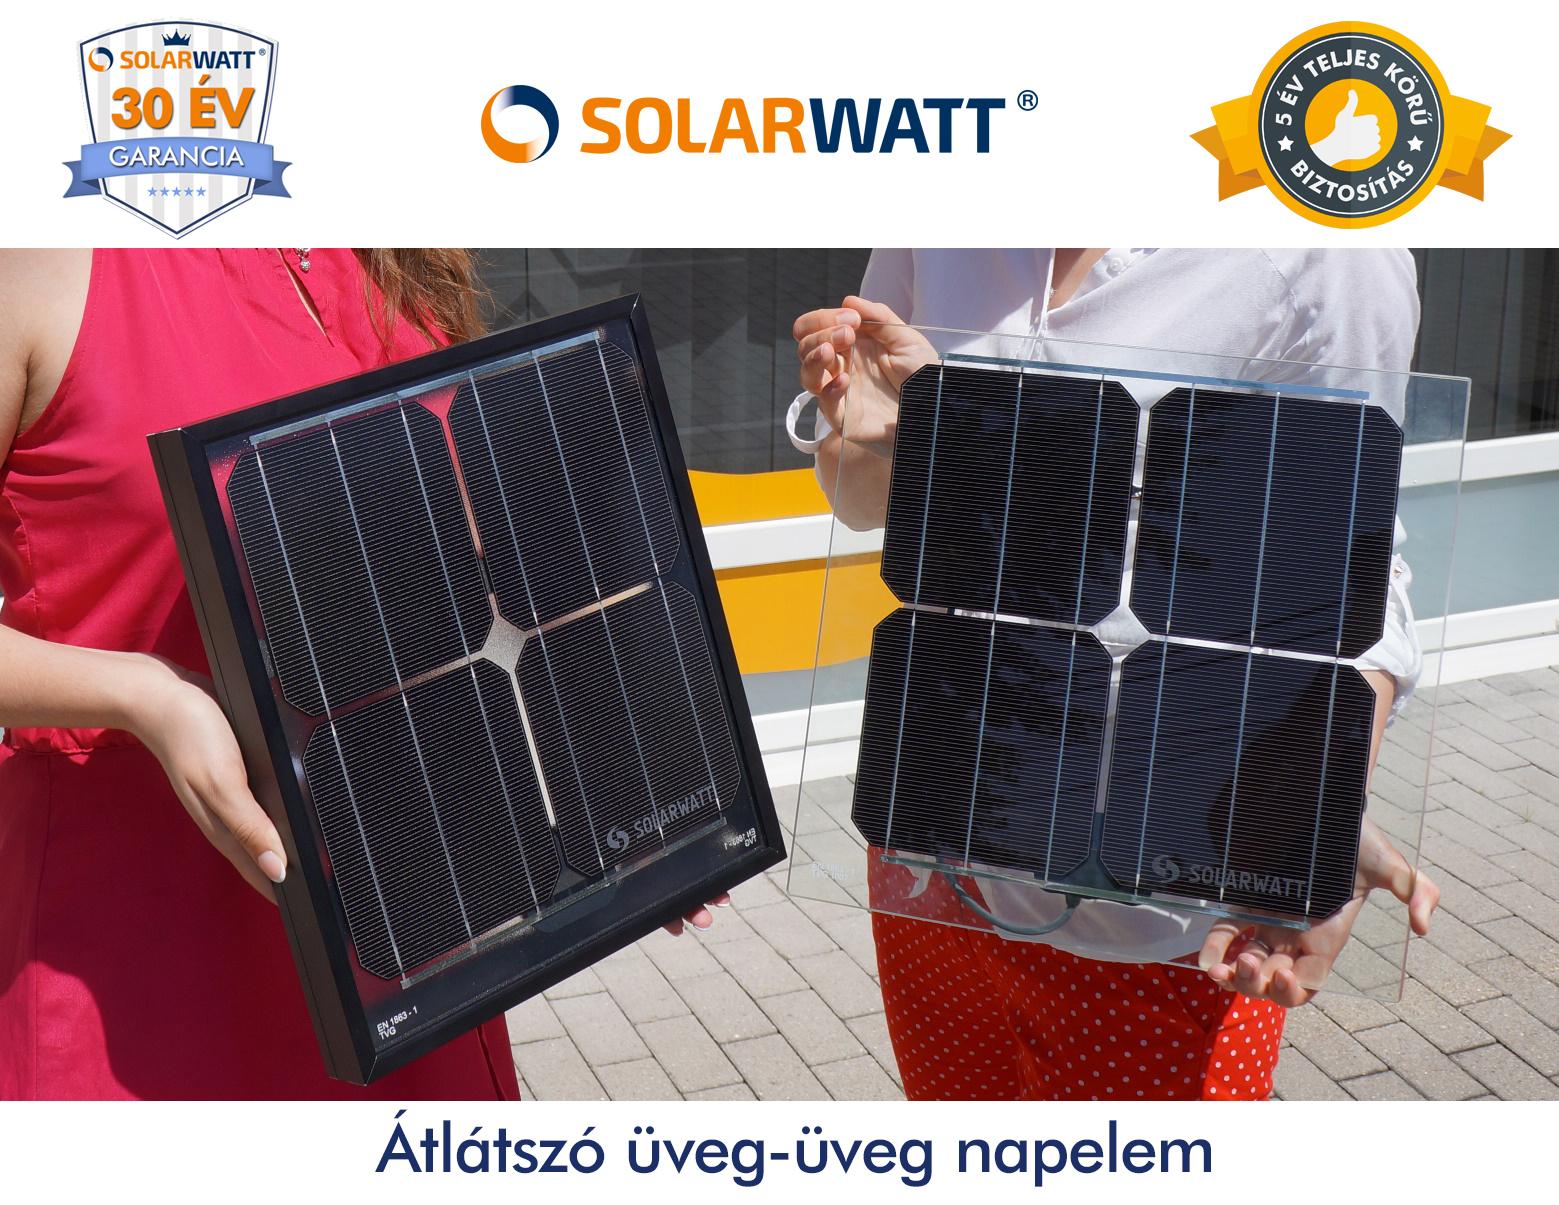 atlatszo_solarwatt_napelem.jpg